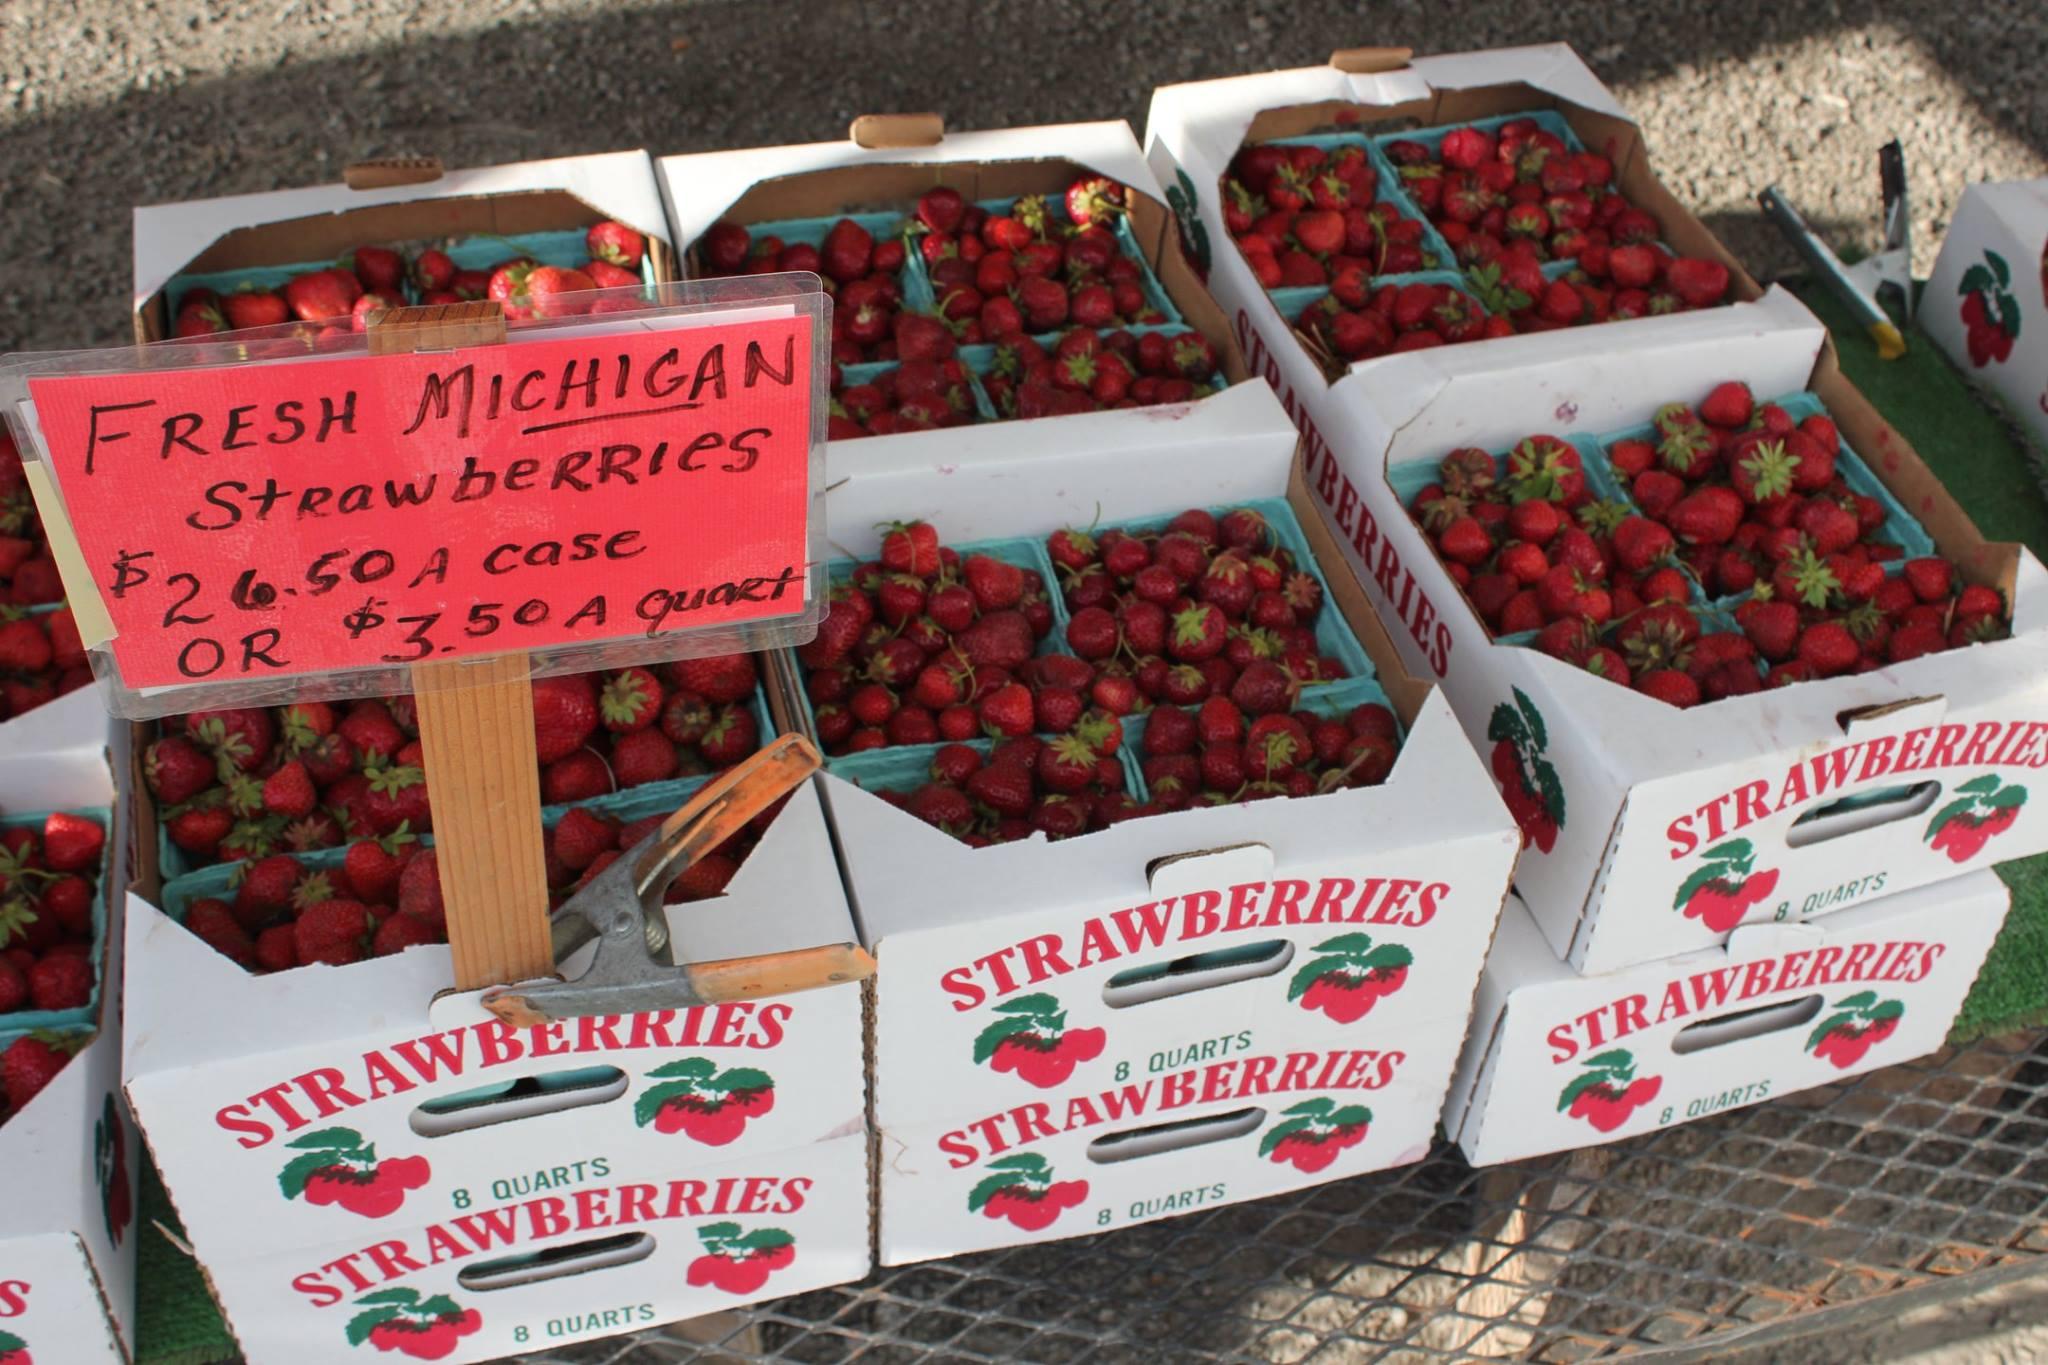 Local produce strawberries at Shipshewana Flea Market